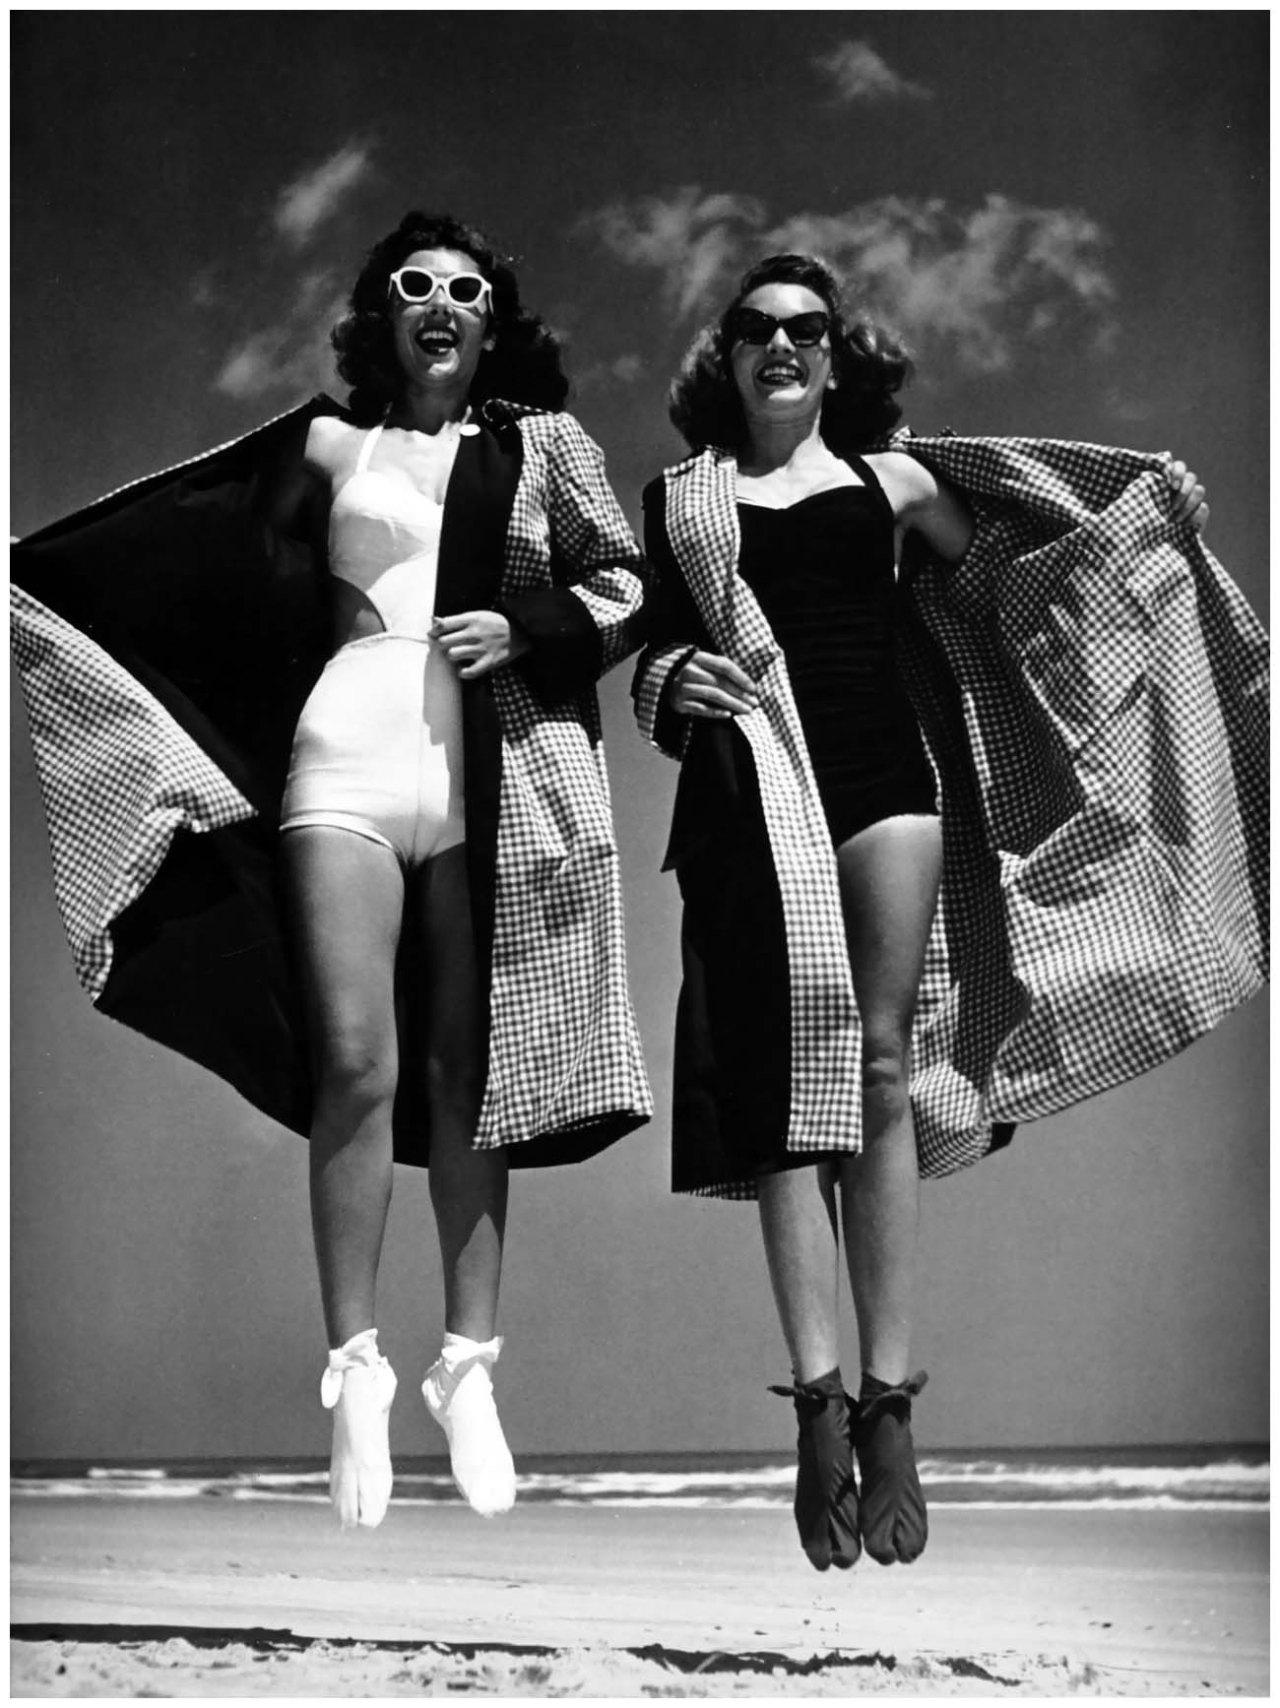 Daytona Beach, Florida. 1946. Photographer: Phillipe Halsman